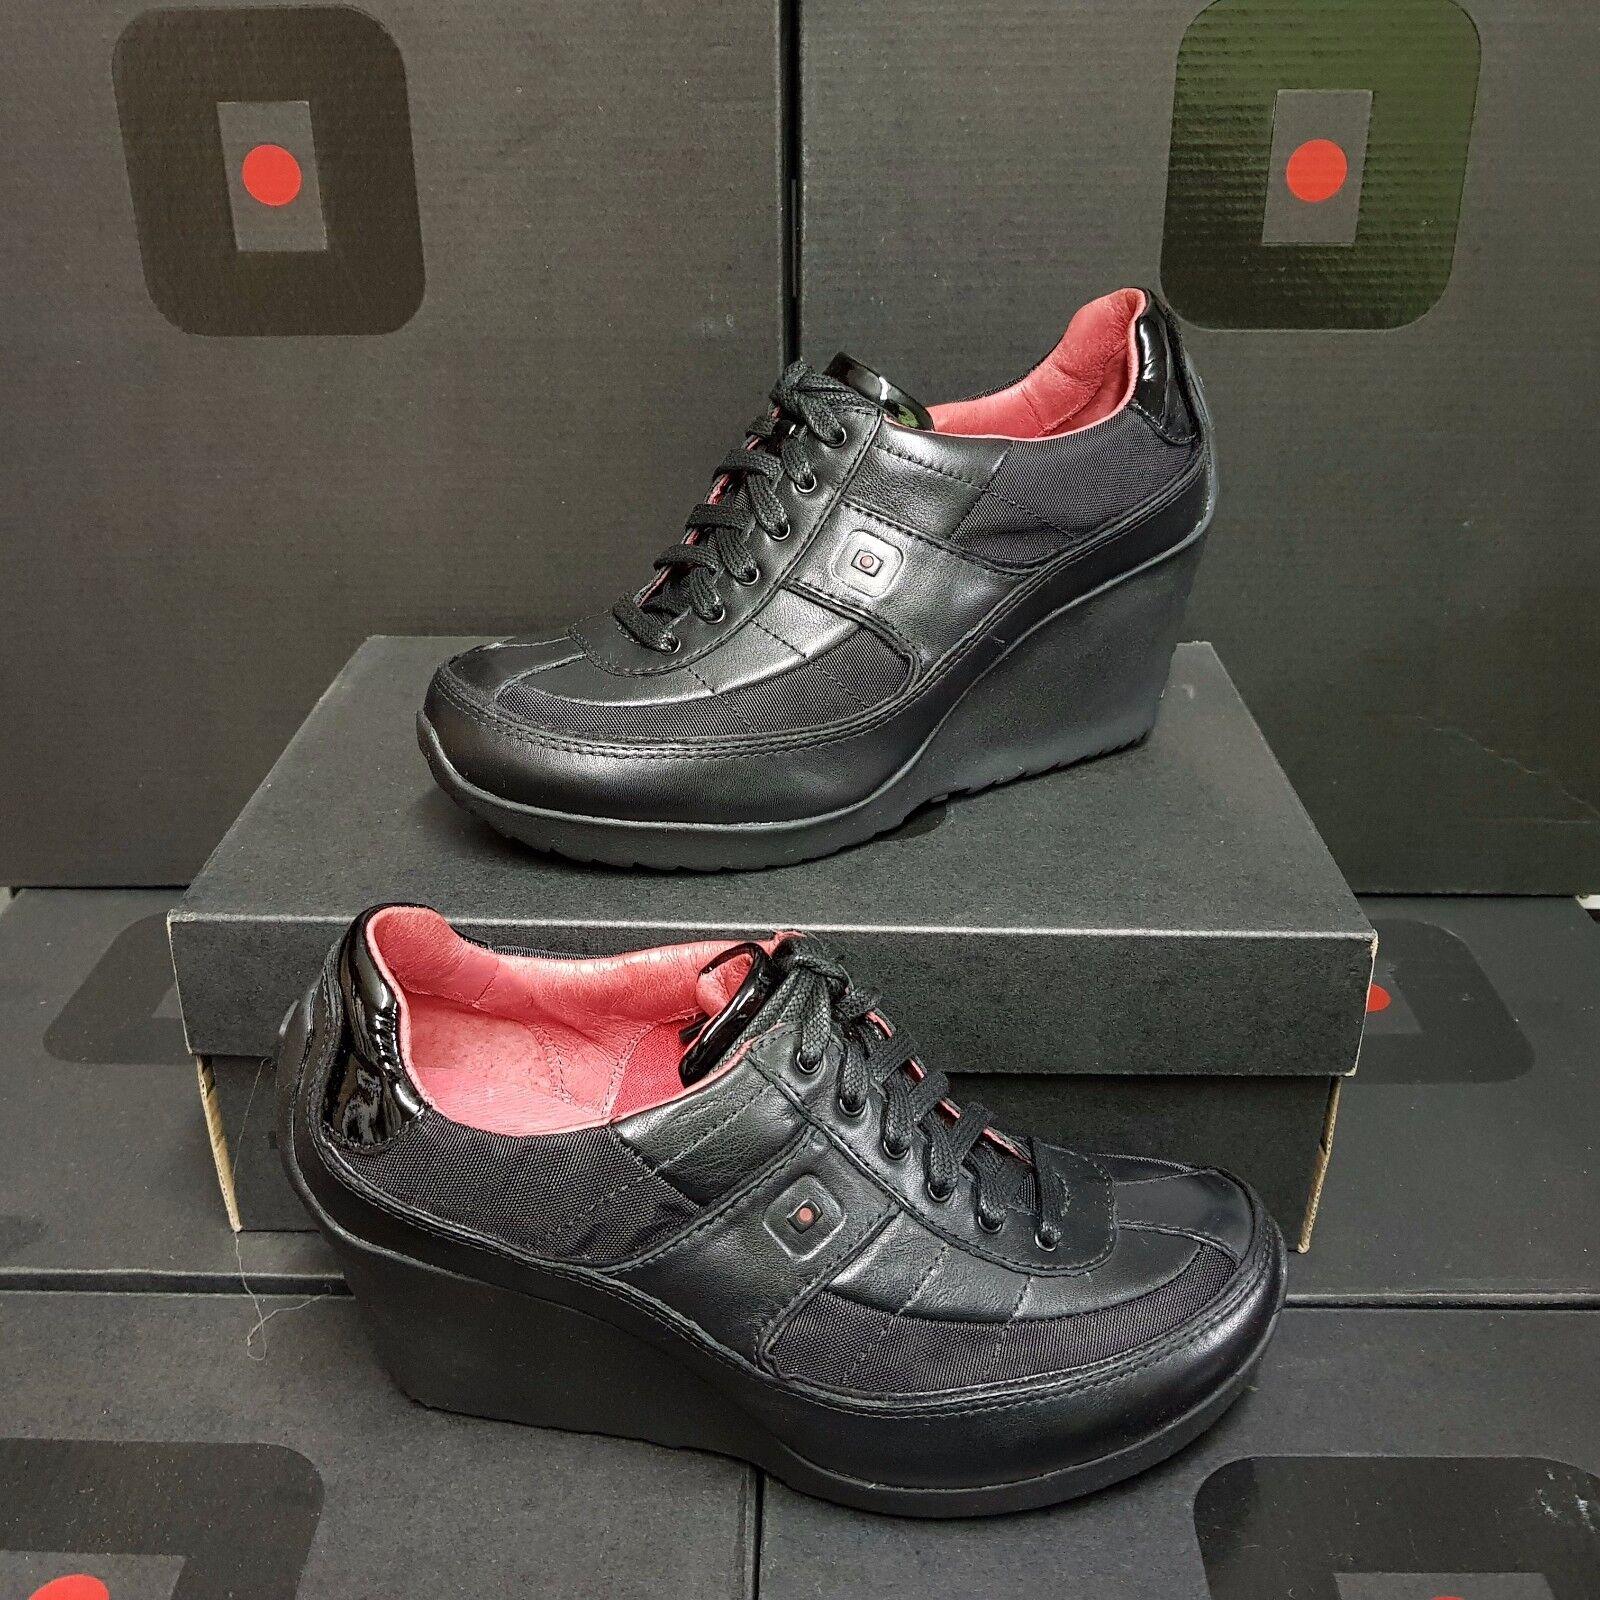 n ° 1 online TSUBO  Fadir    Compensé Cuir Donna  stivali scarpe US 7.5 EUR 38,5 (rrp )  clienti prima reputazione prima